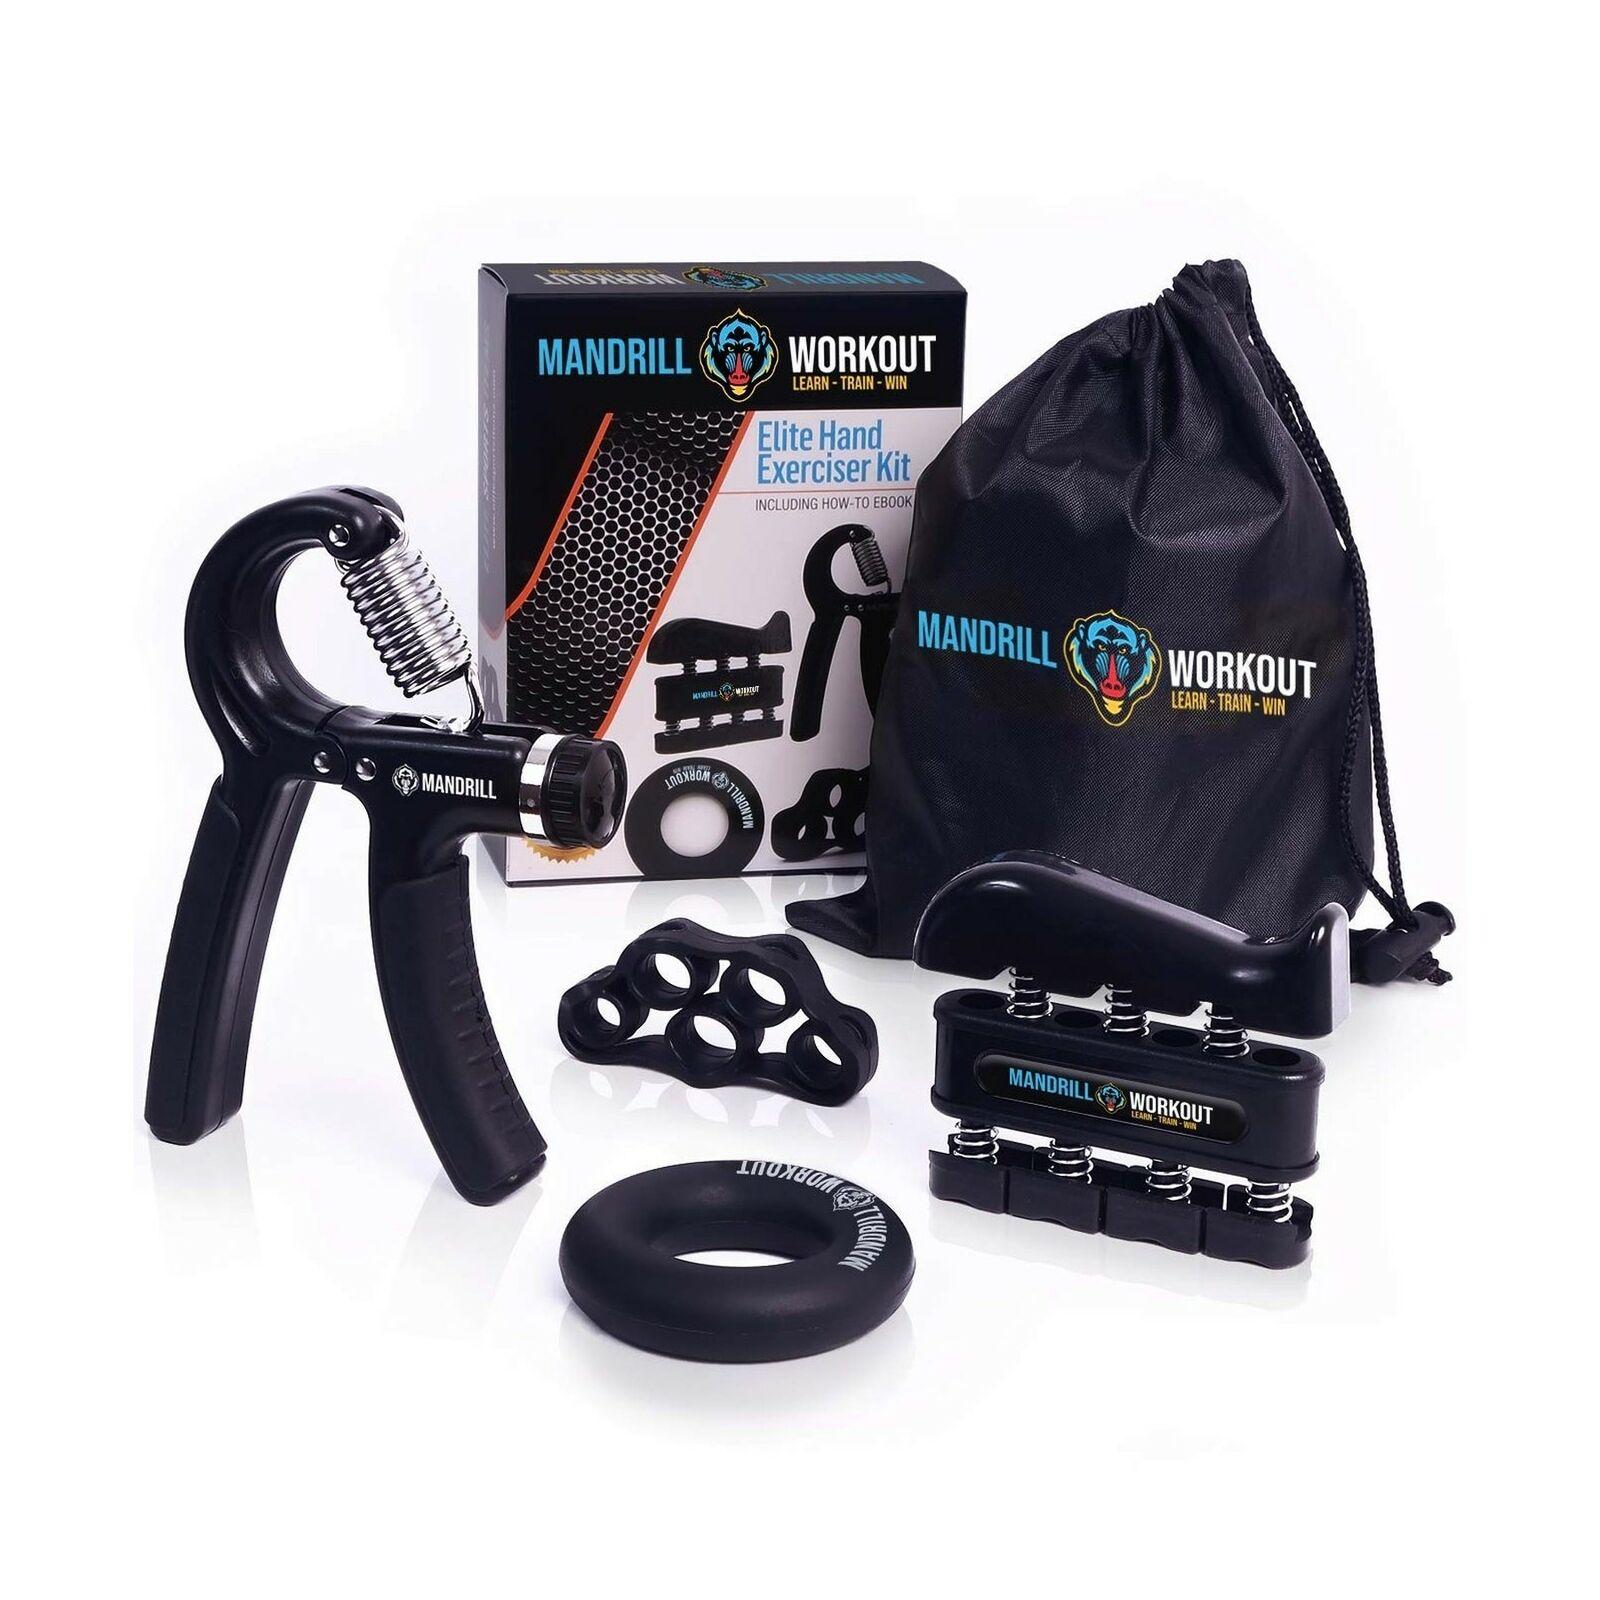 5 Pack Finger Stretcher, - Finger Exerciser Hand Grip Strengthener Workout